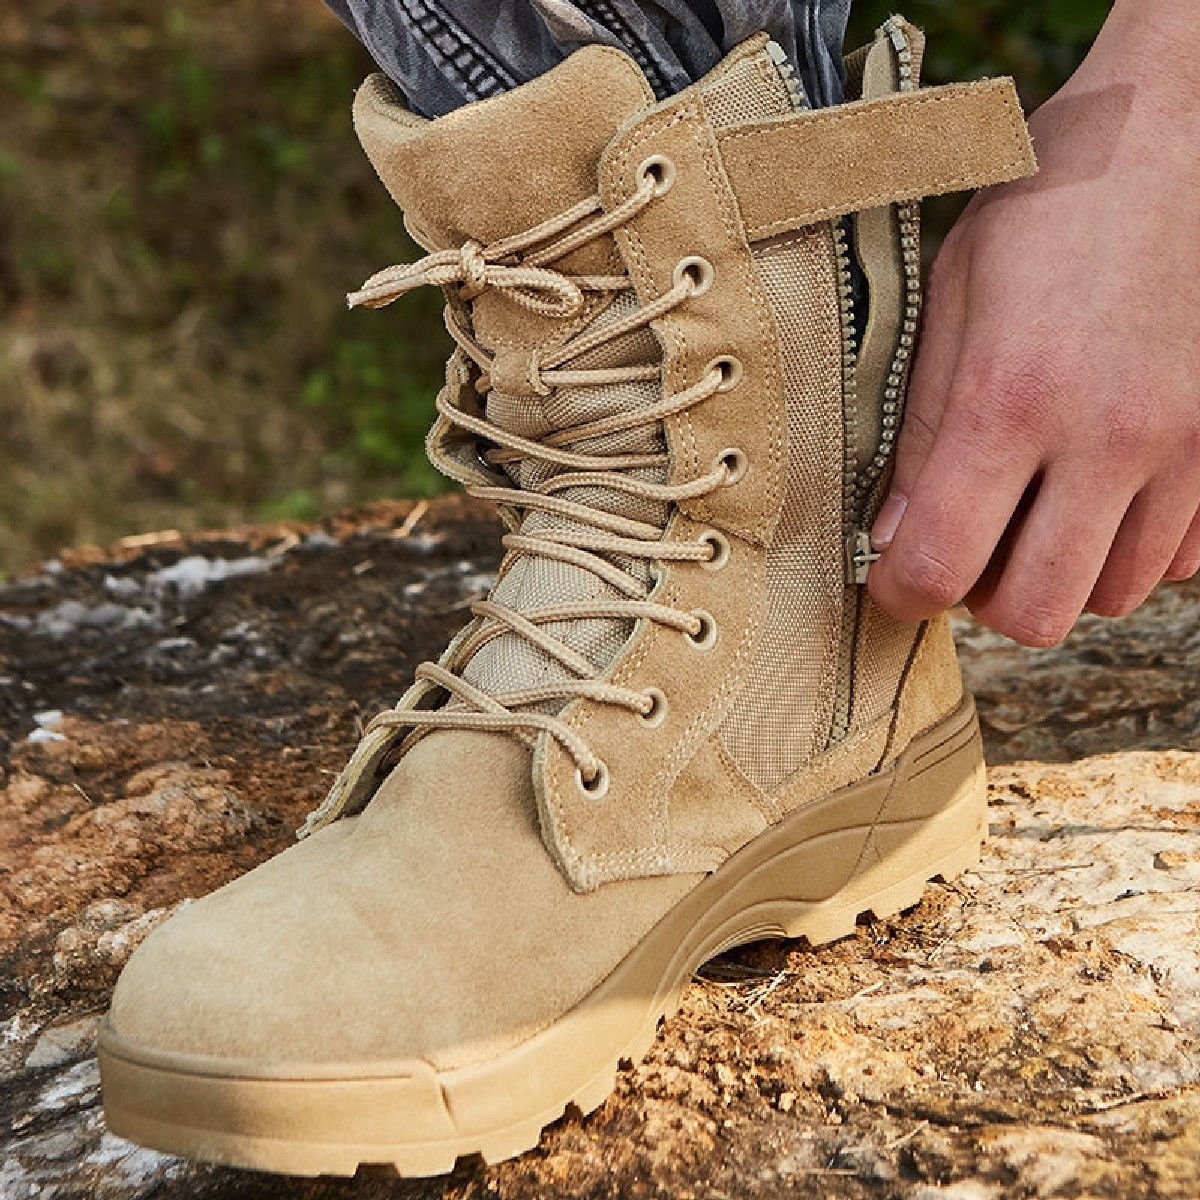 Delta army commando leather shoes Khaaki camel Shoes Commando Trekking Boots for men & boys